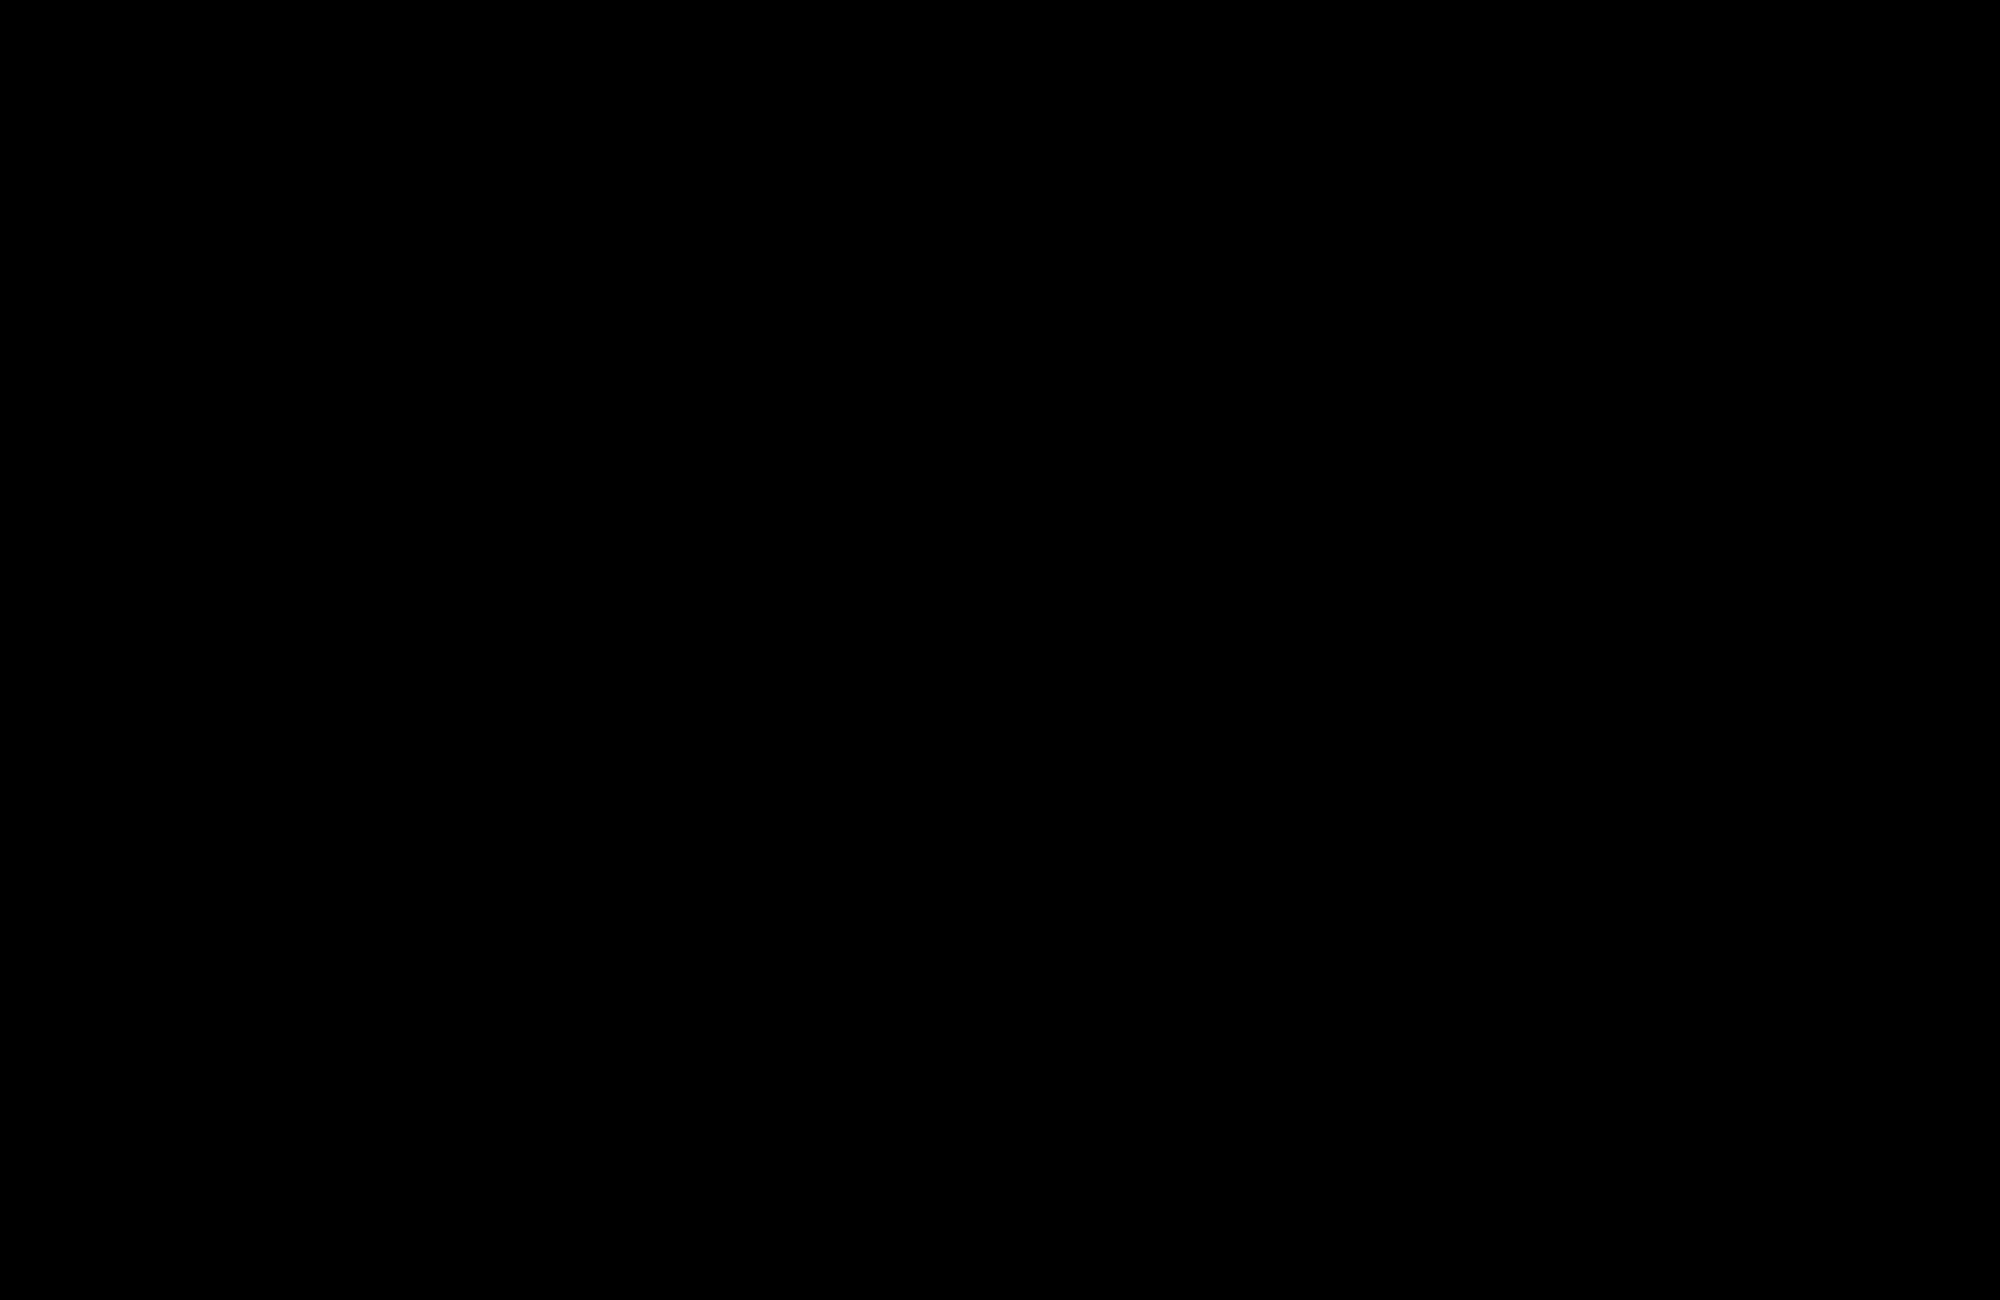 EXM8N Neodymium Series Midrange Frequency Response